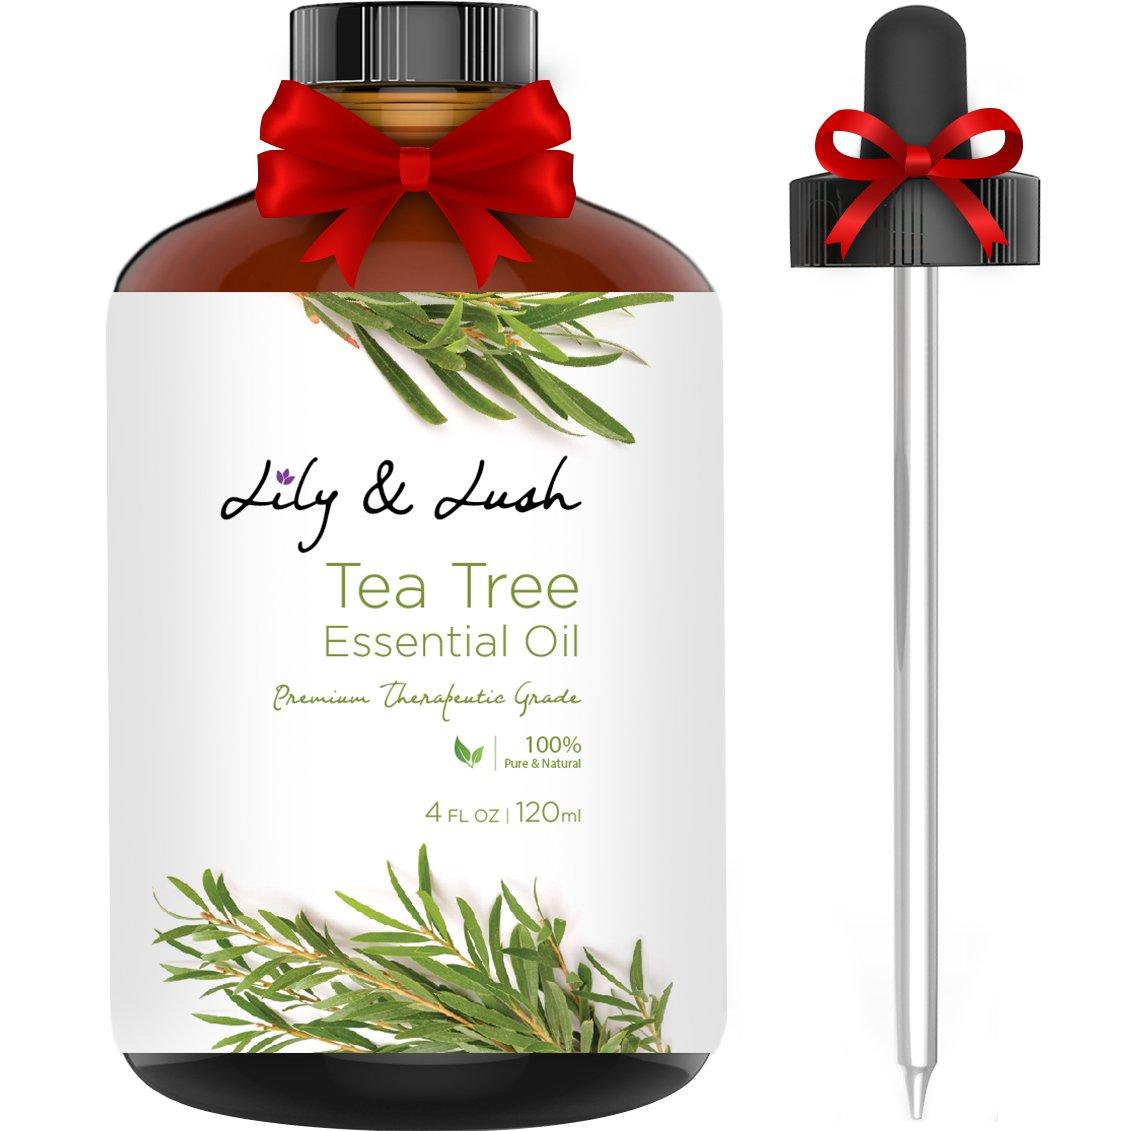 Amazon.com : Lily & Lush XL Bottle 100% Pure Australian Tea Tree ...